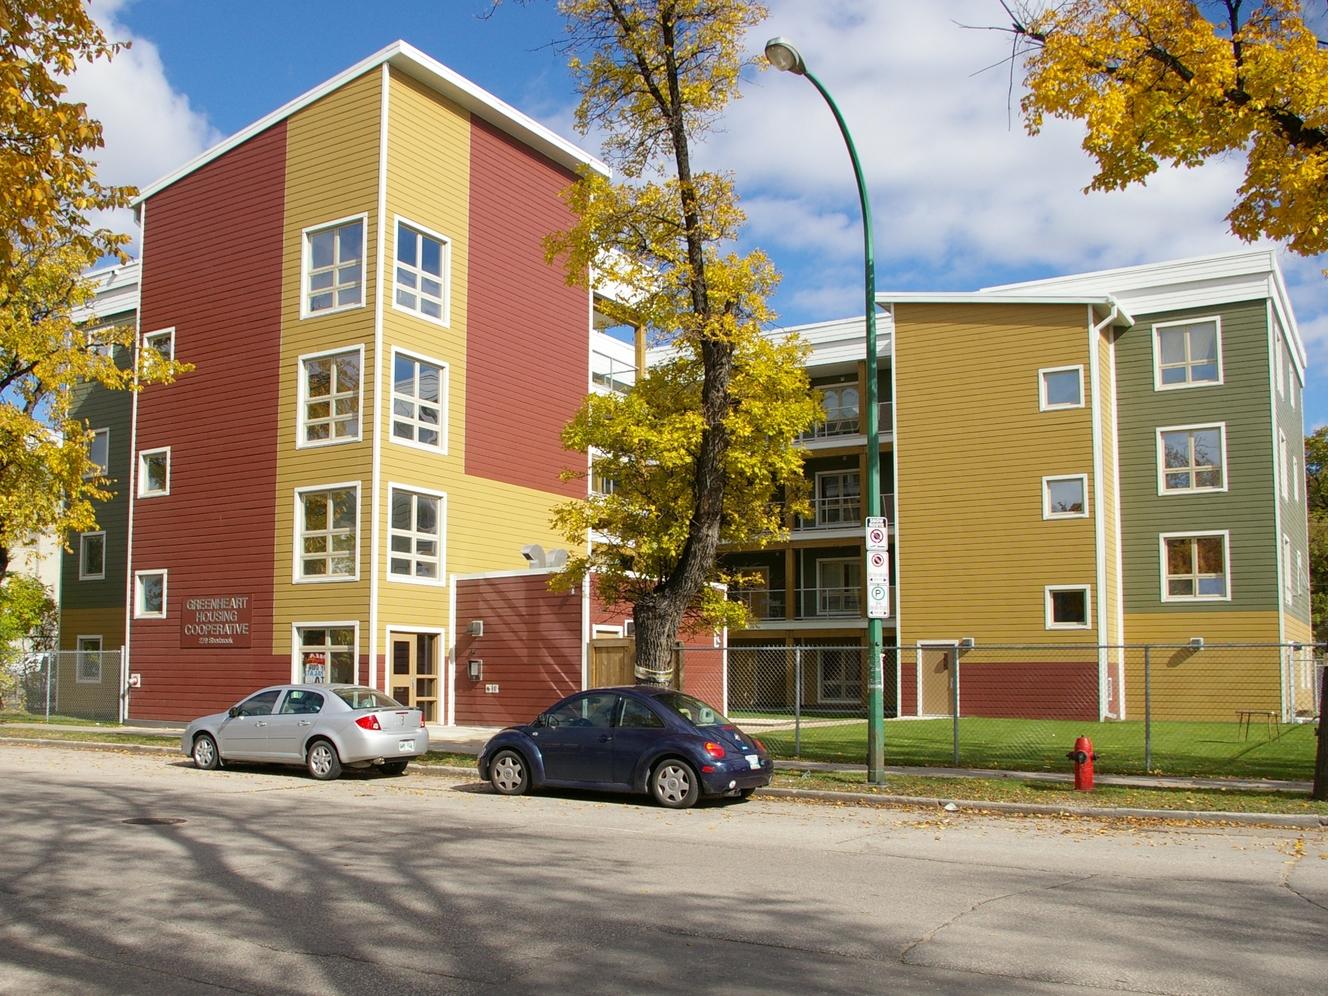 Greenheart Housing Cooperative